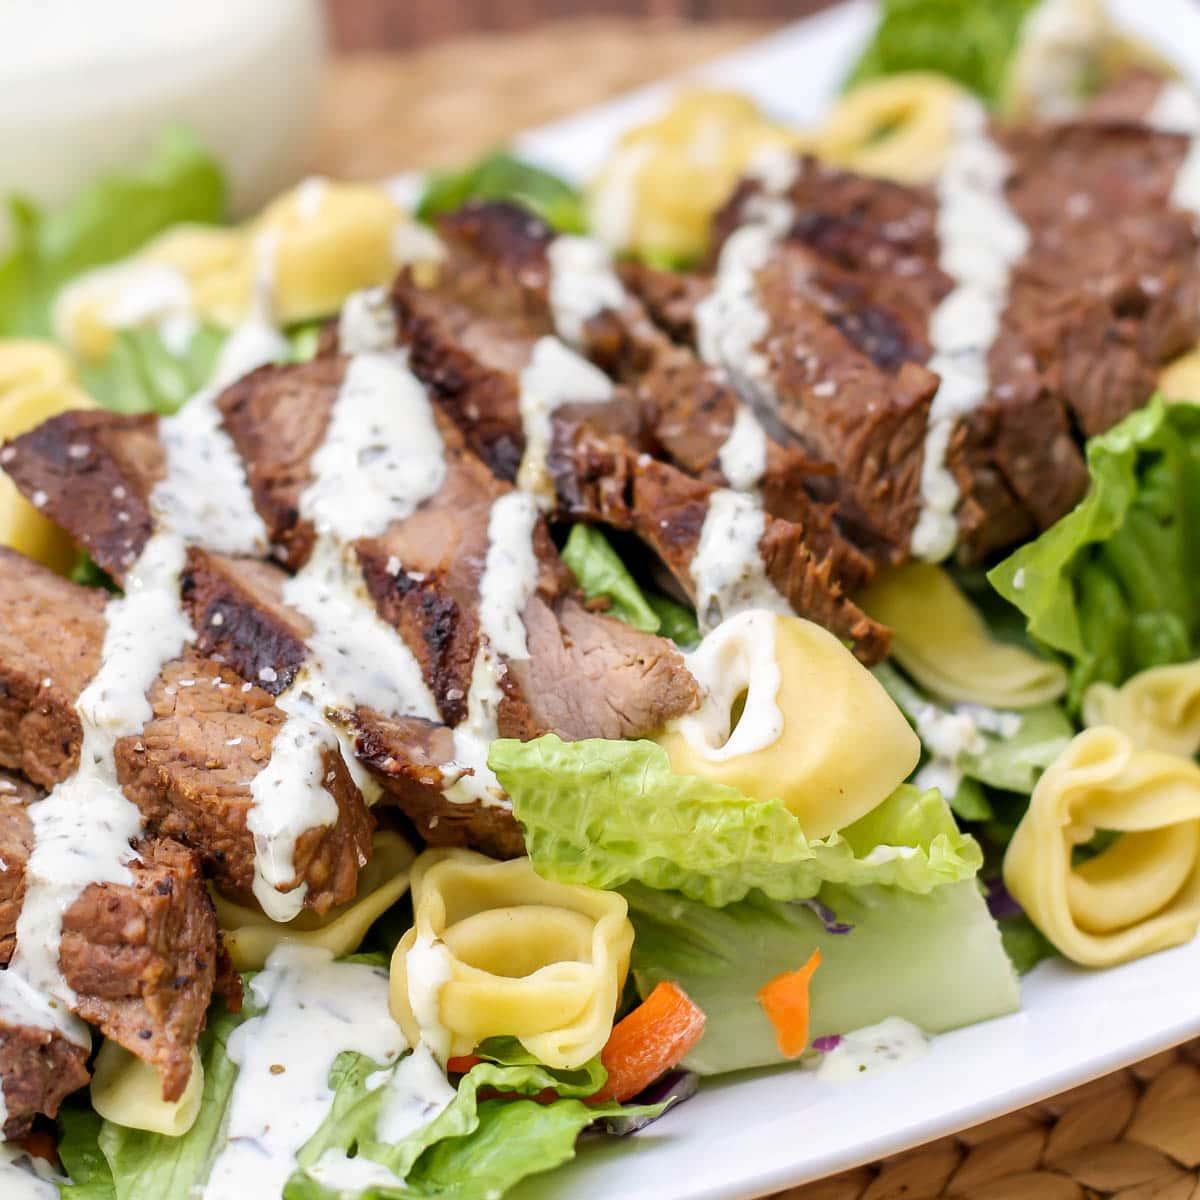 Dressed steak on a bed of salad.